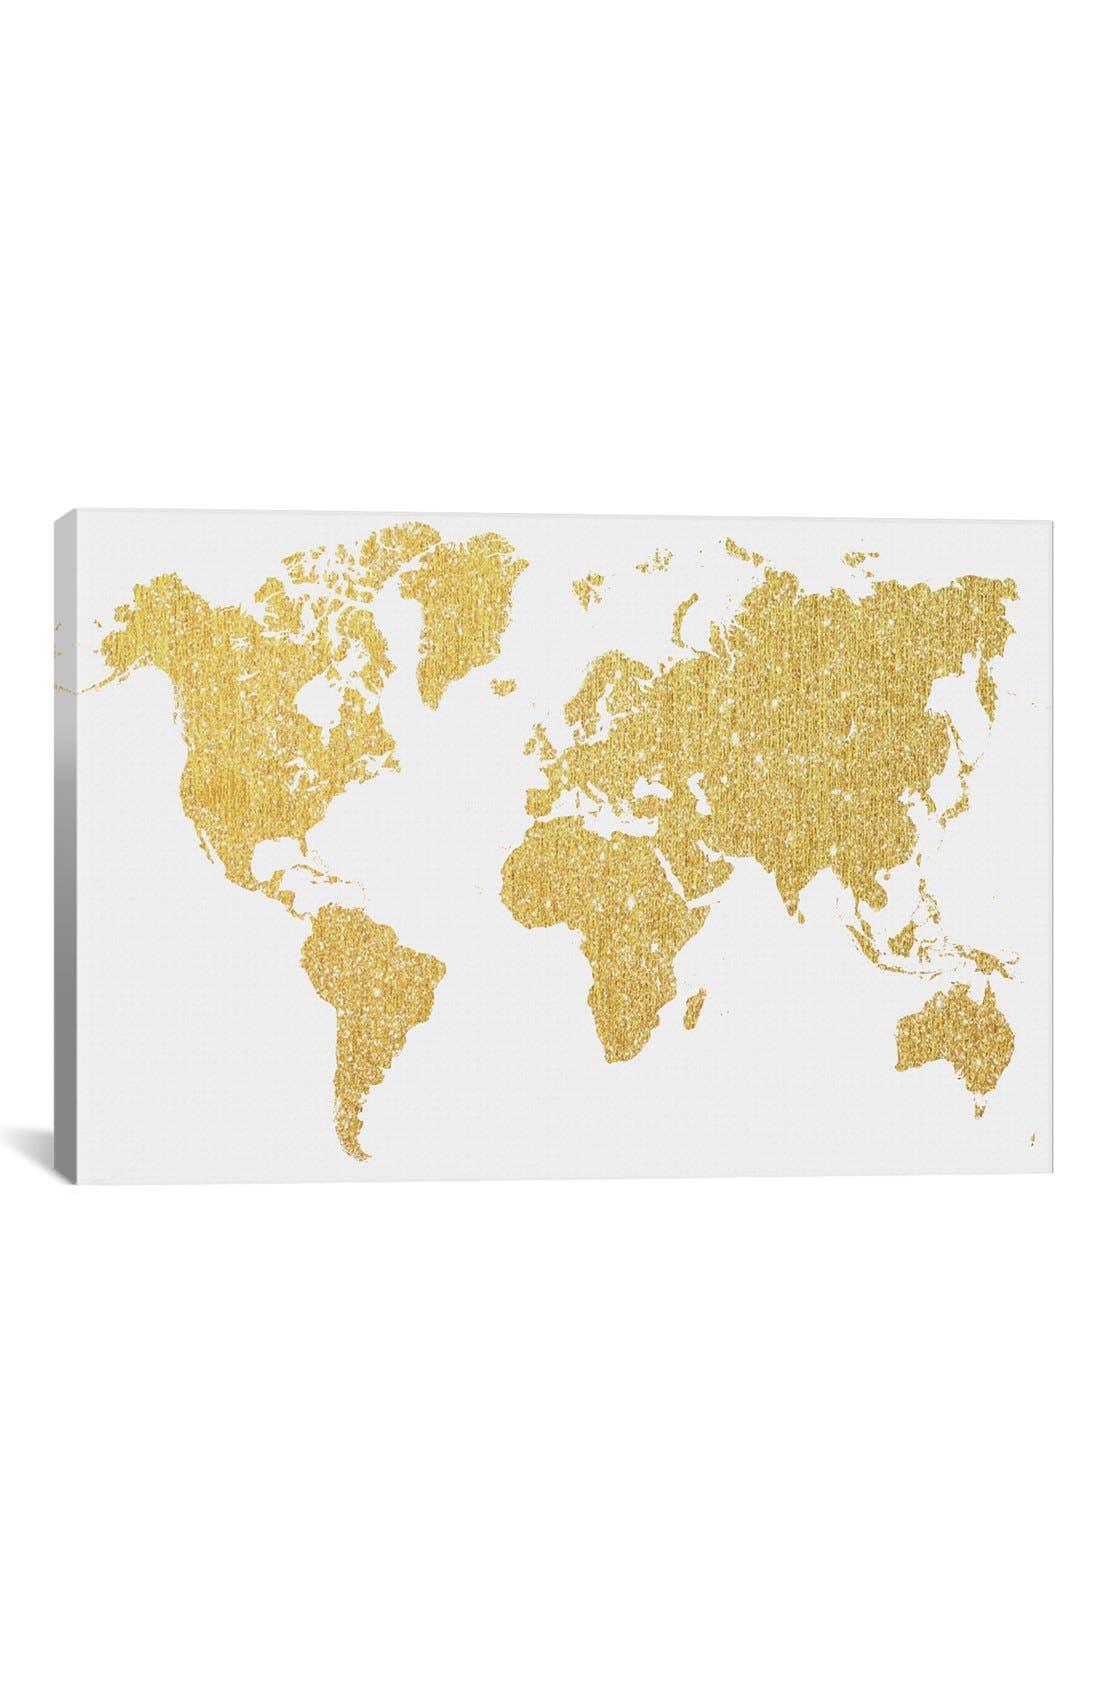 Main Image - iCanvas 'Gold Map' Giclée Print Canvas Art